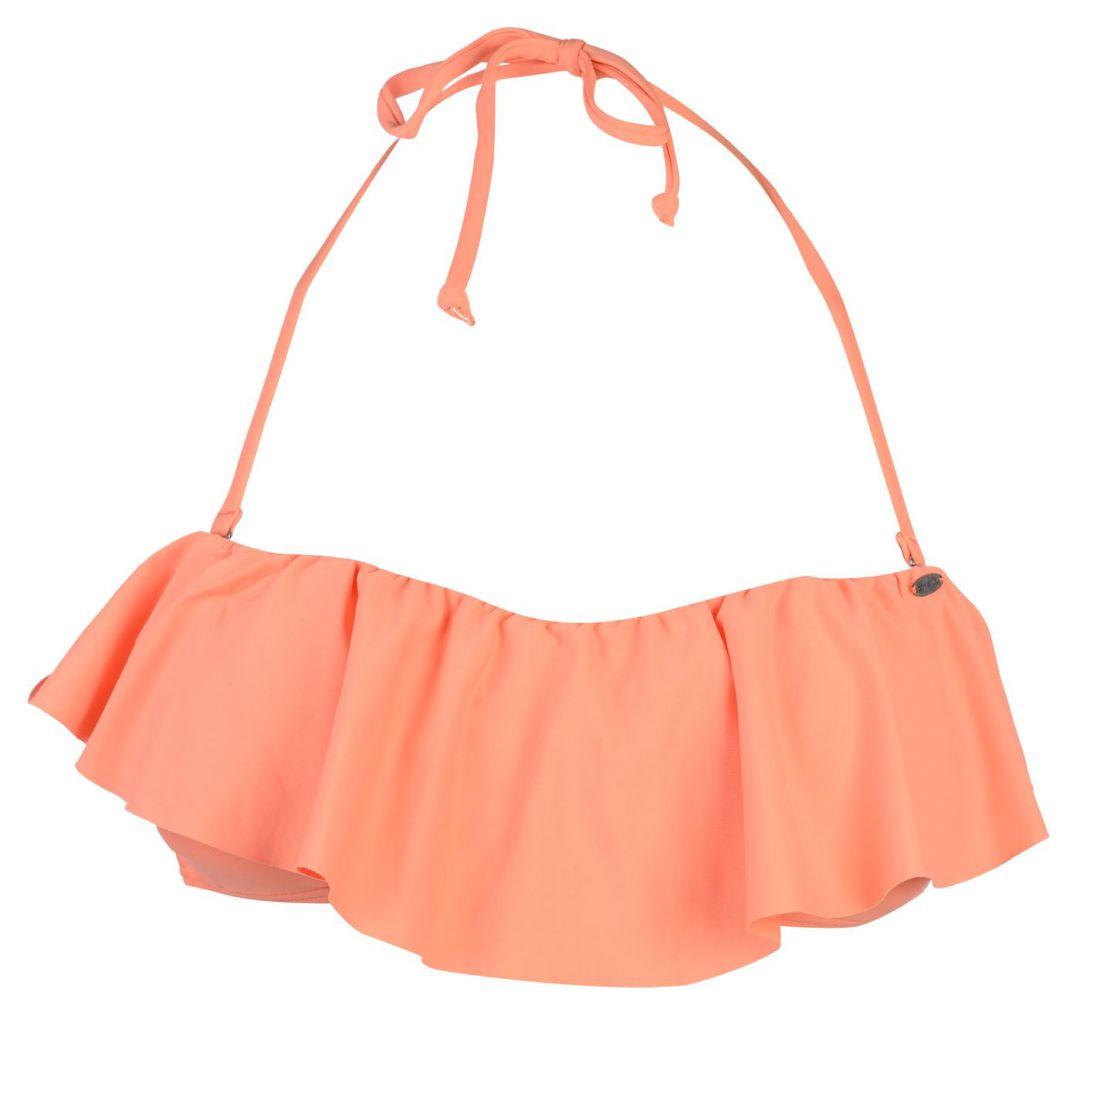 ONeill Ruffle Bikini Top Ladies Block Colour Tie Fastening